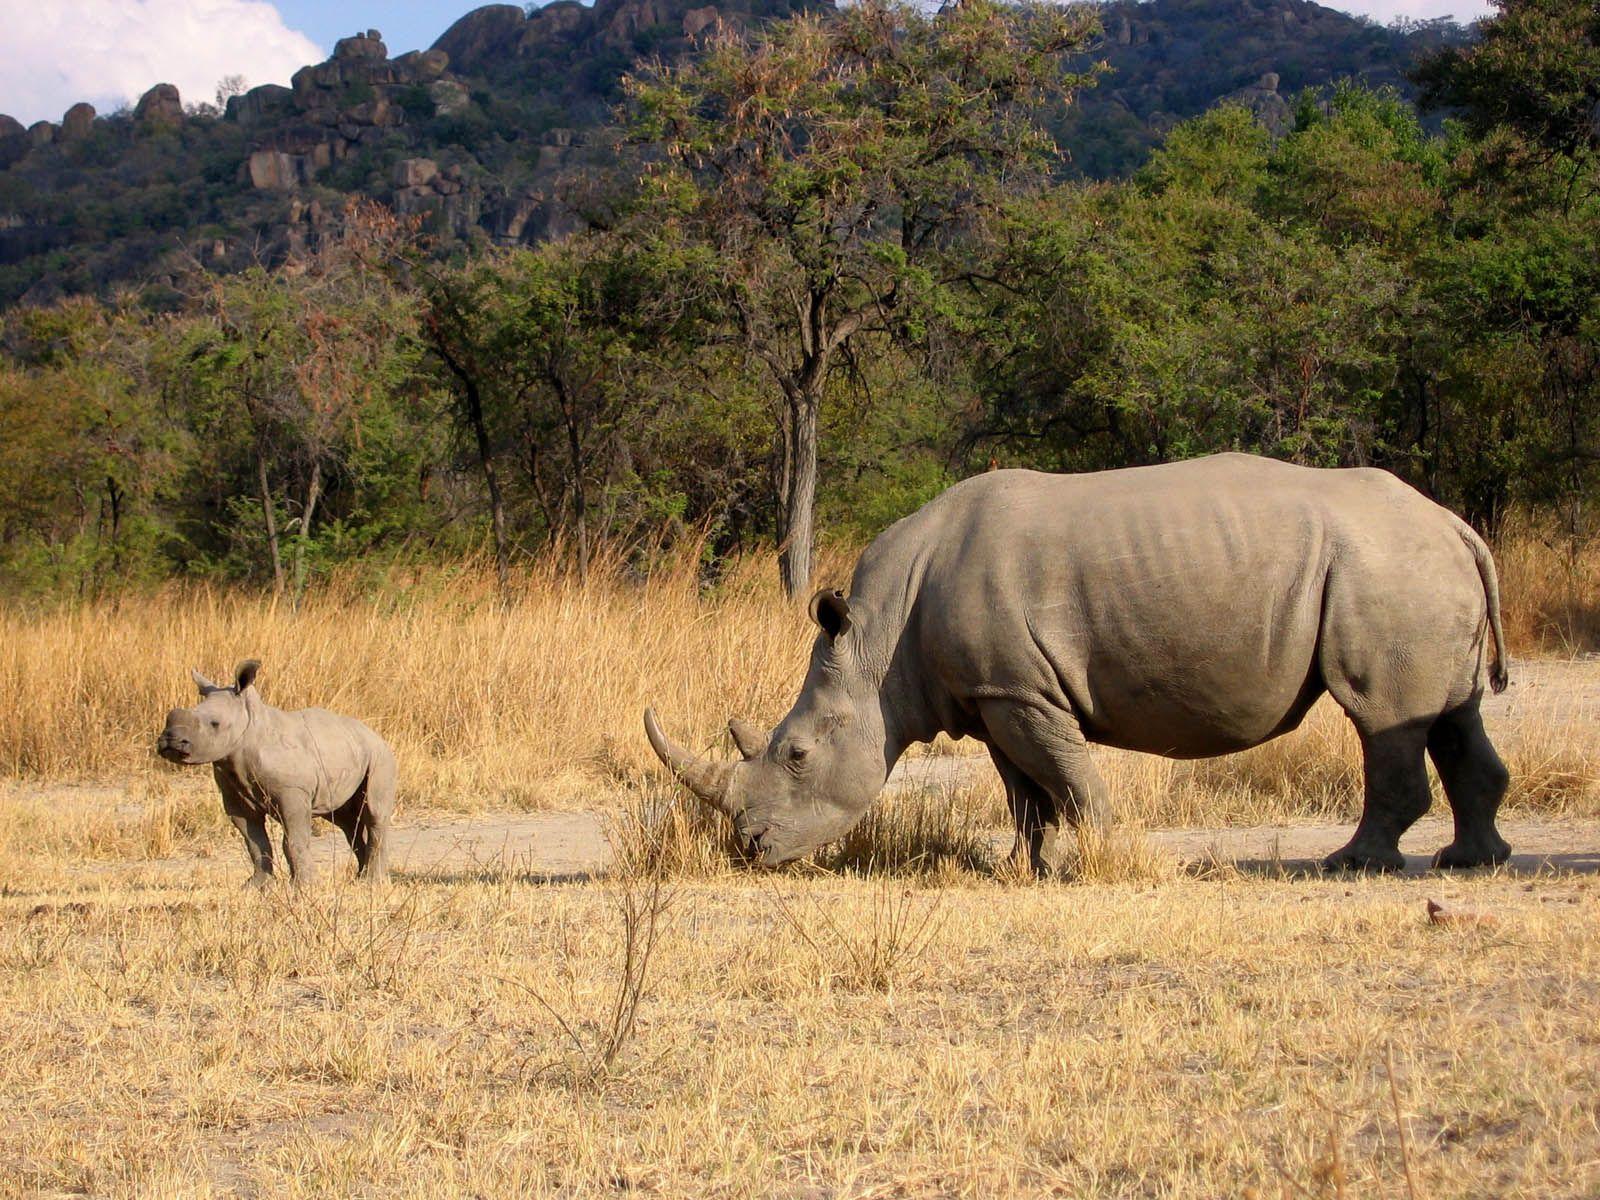 wallpapers rhinoceros wallpapers animalmammals